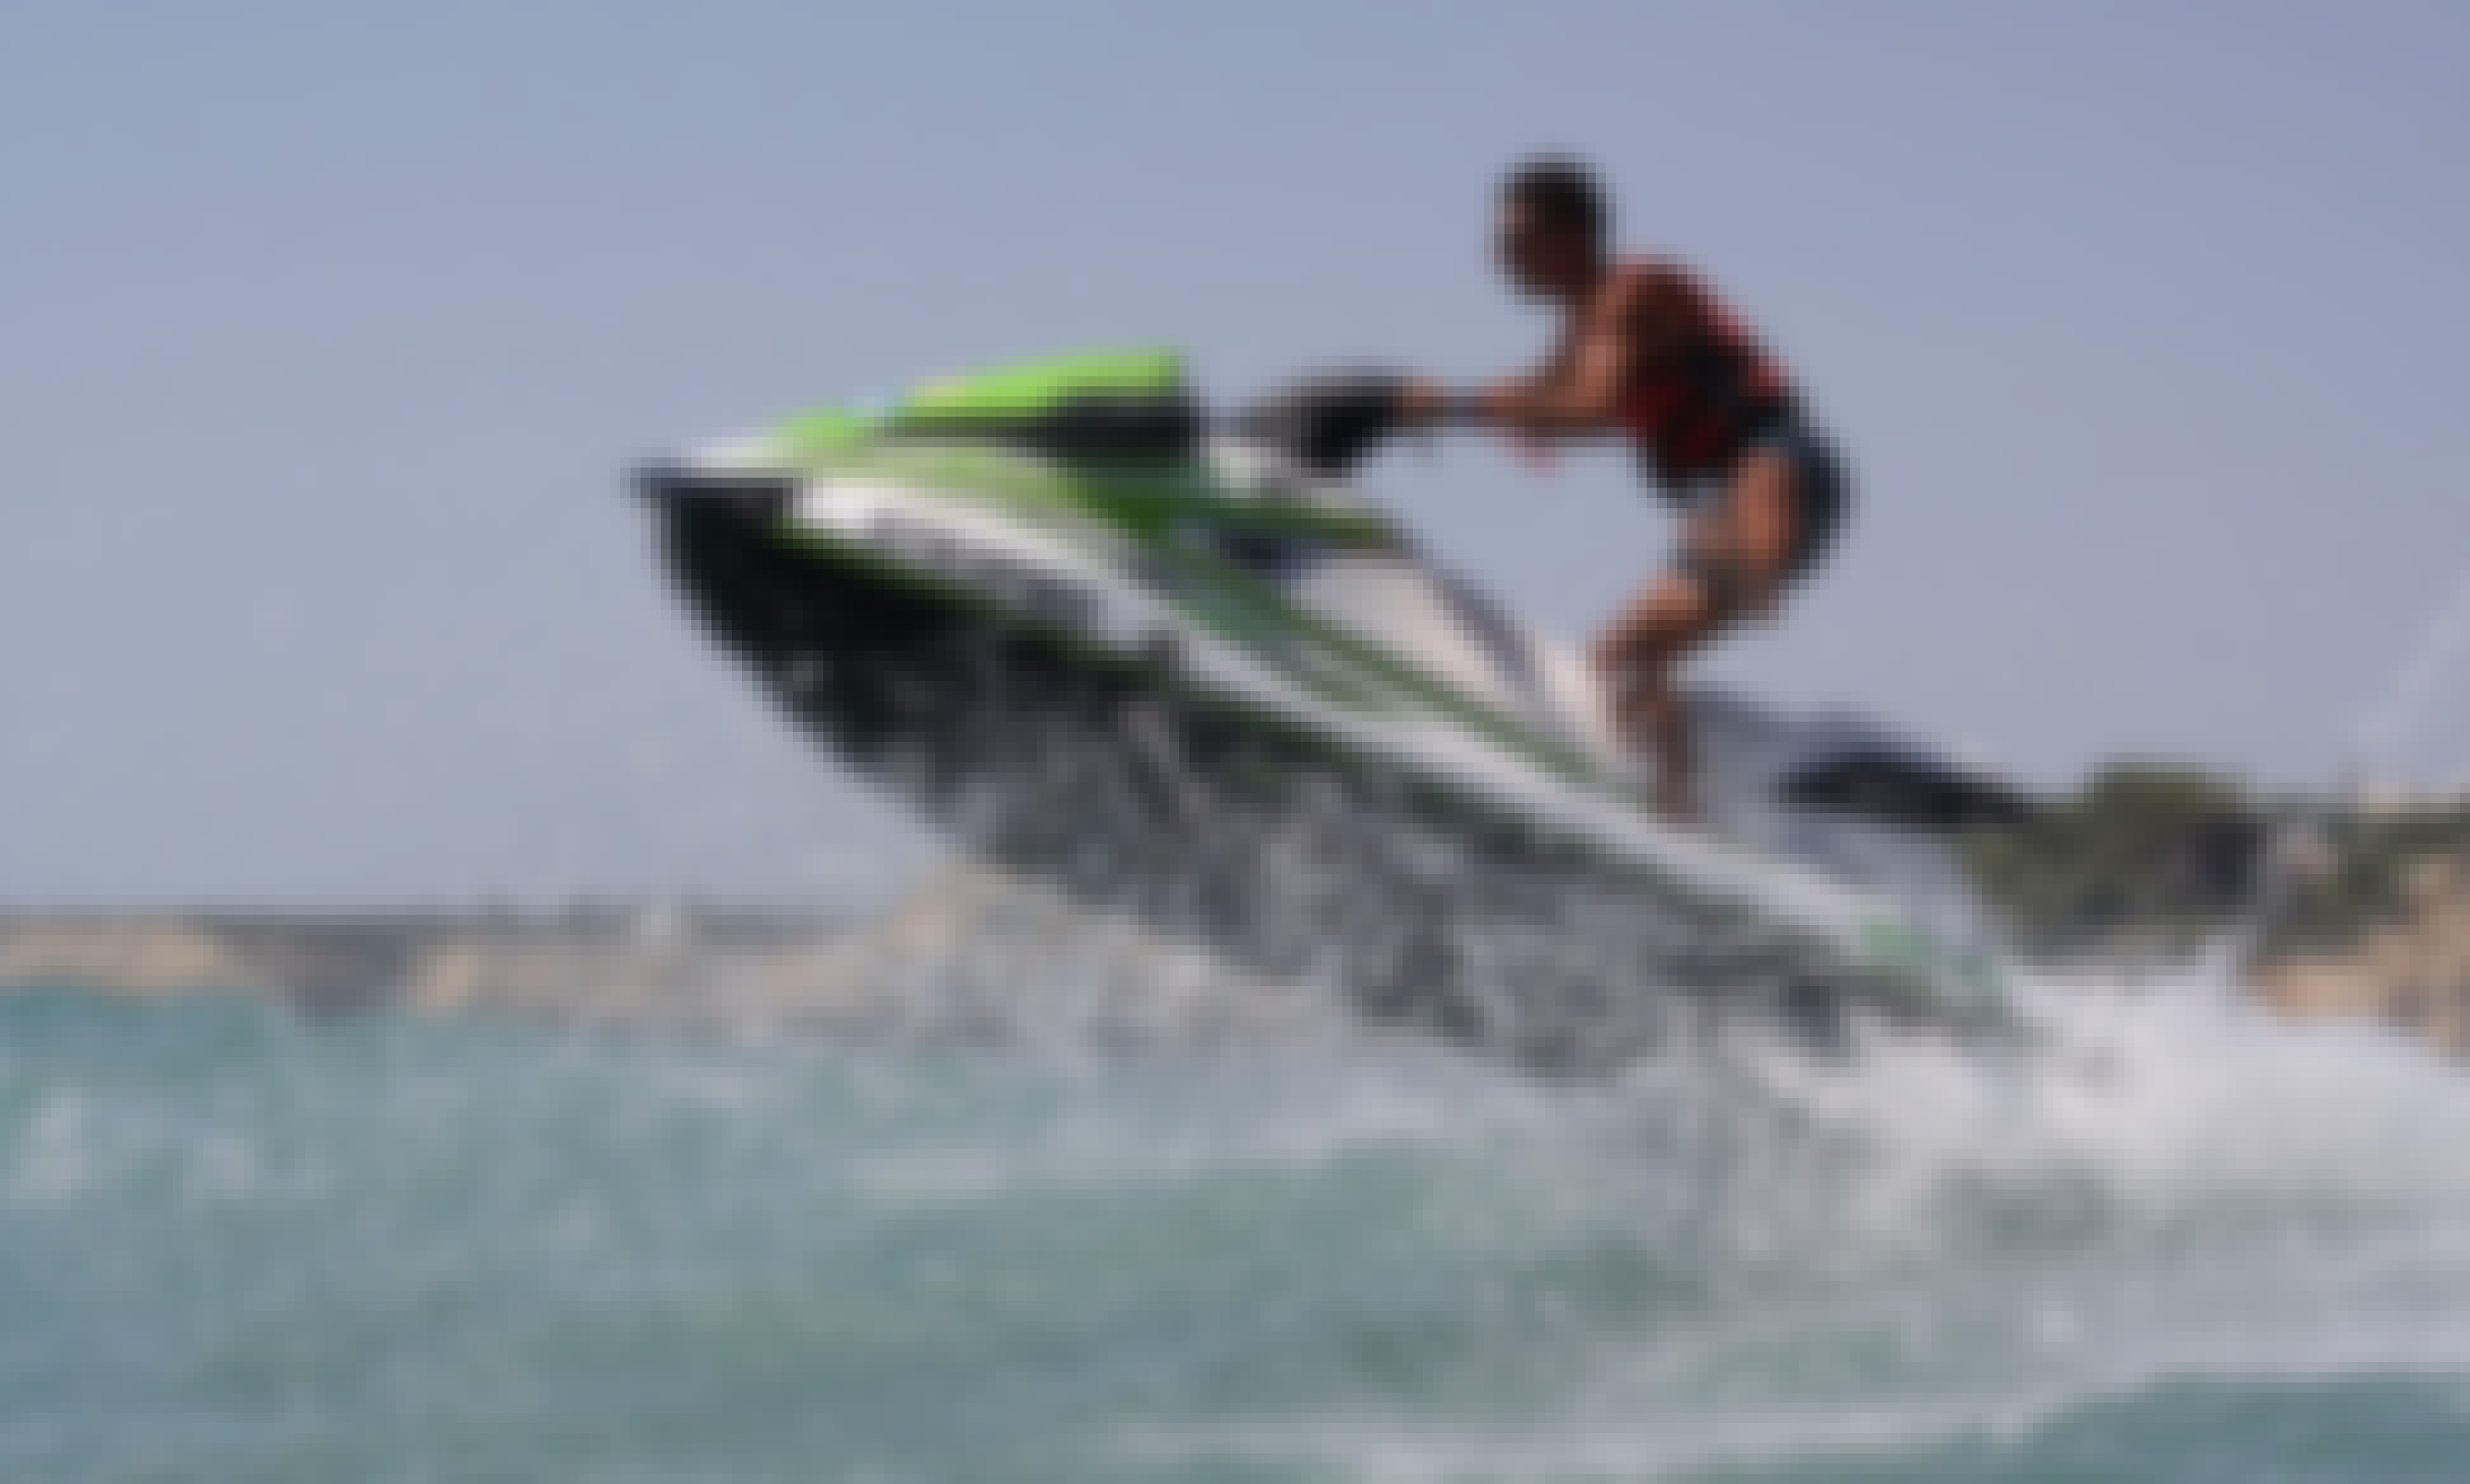 Rent a Yamaha Waverunner Jetski in Armacao de Pera, Algarve, Portugal